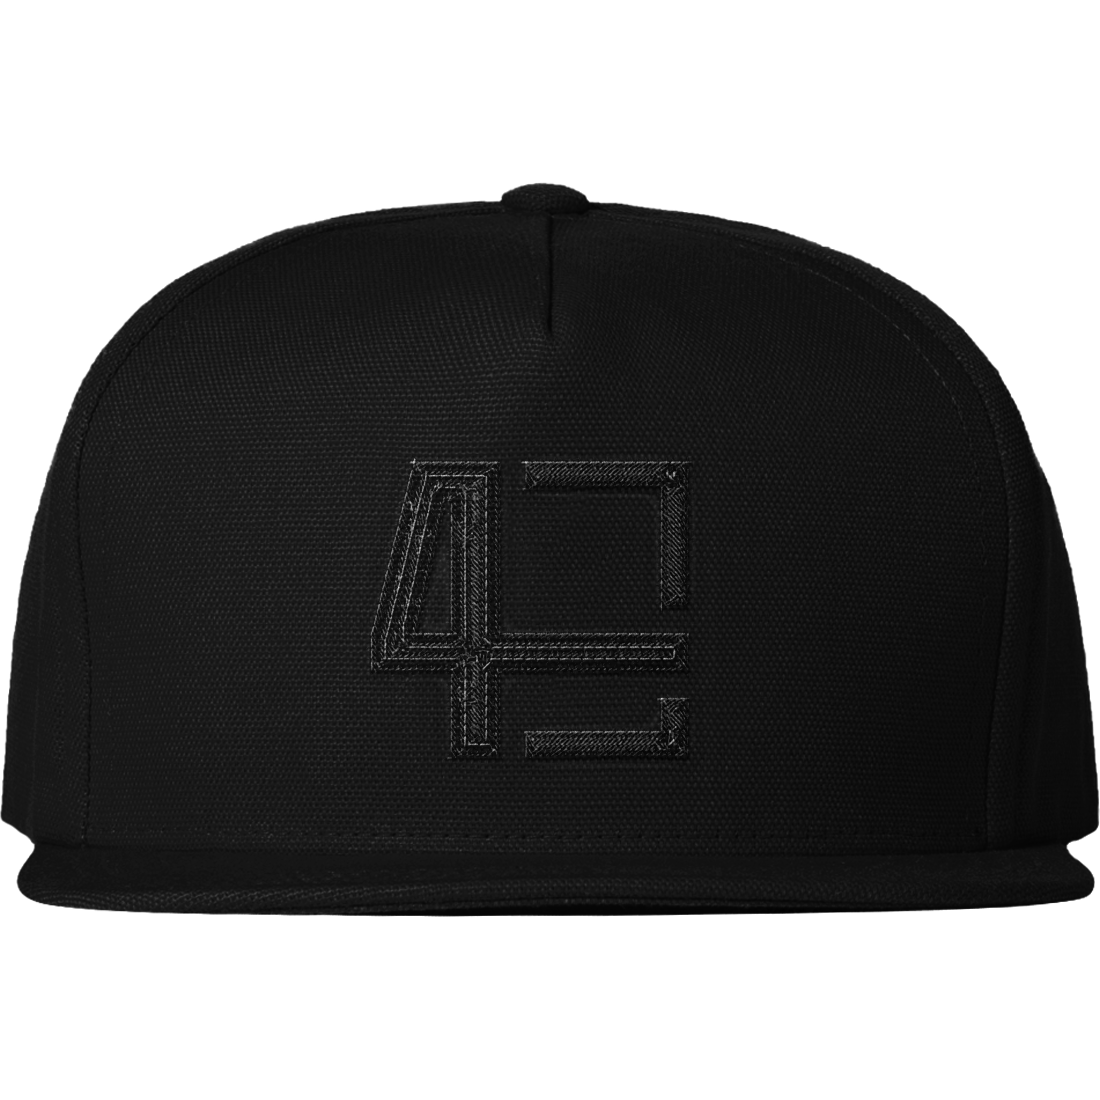 4WD-HAT-002